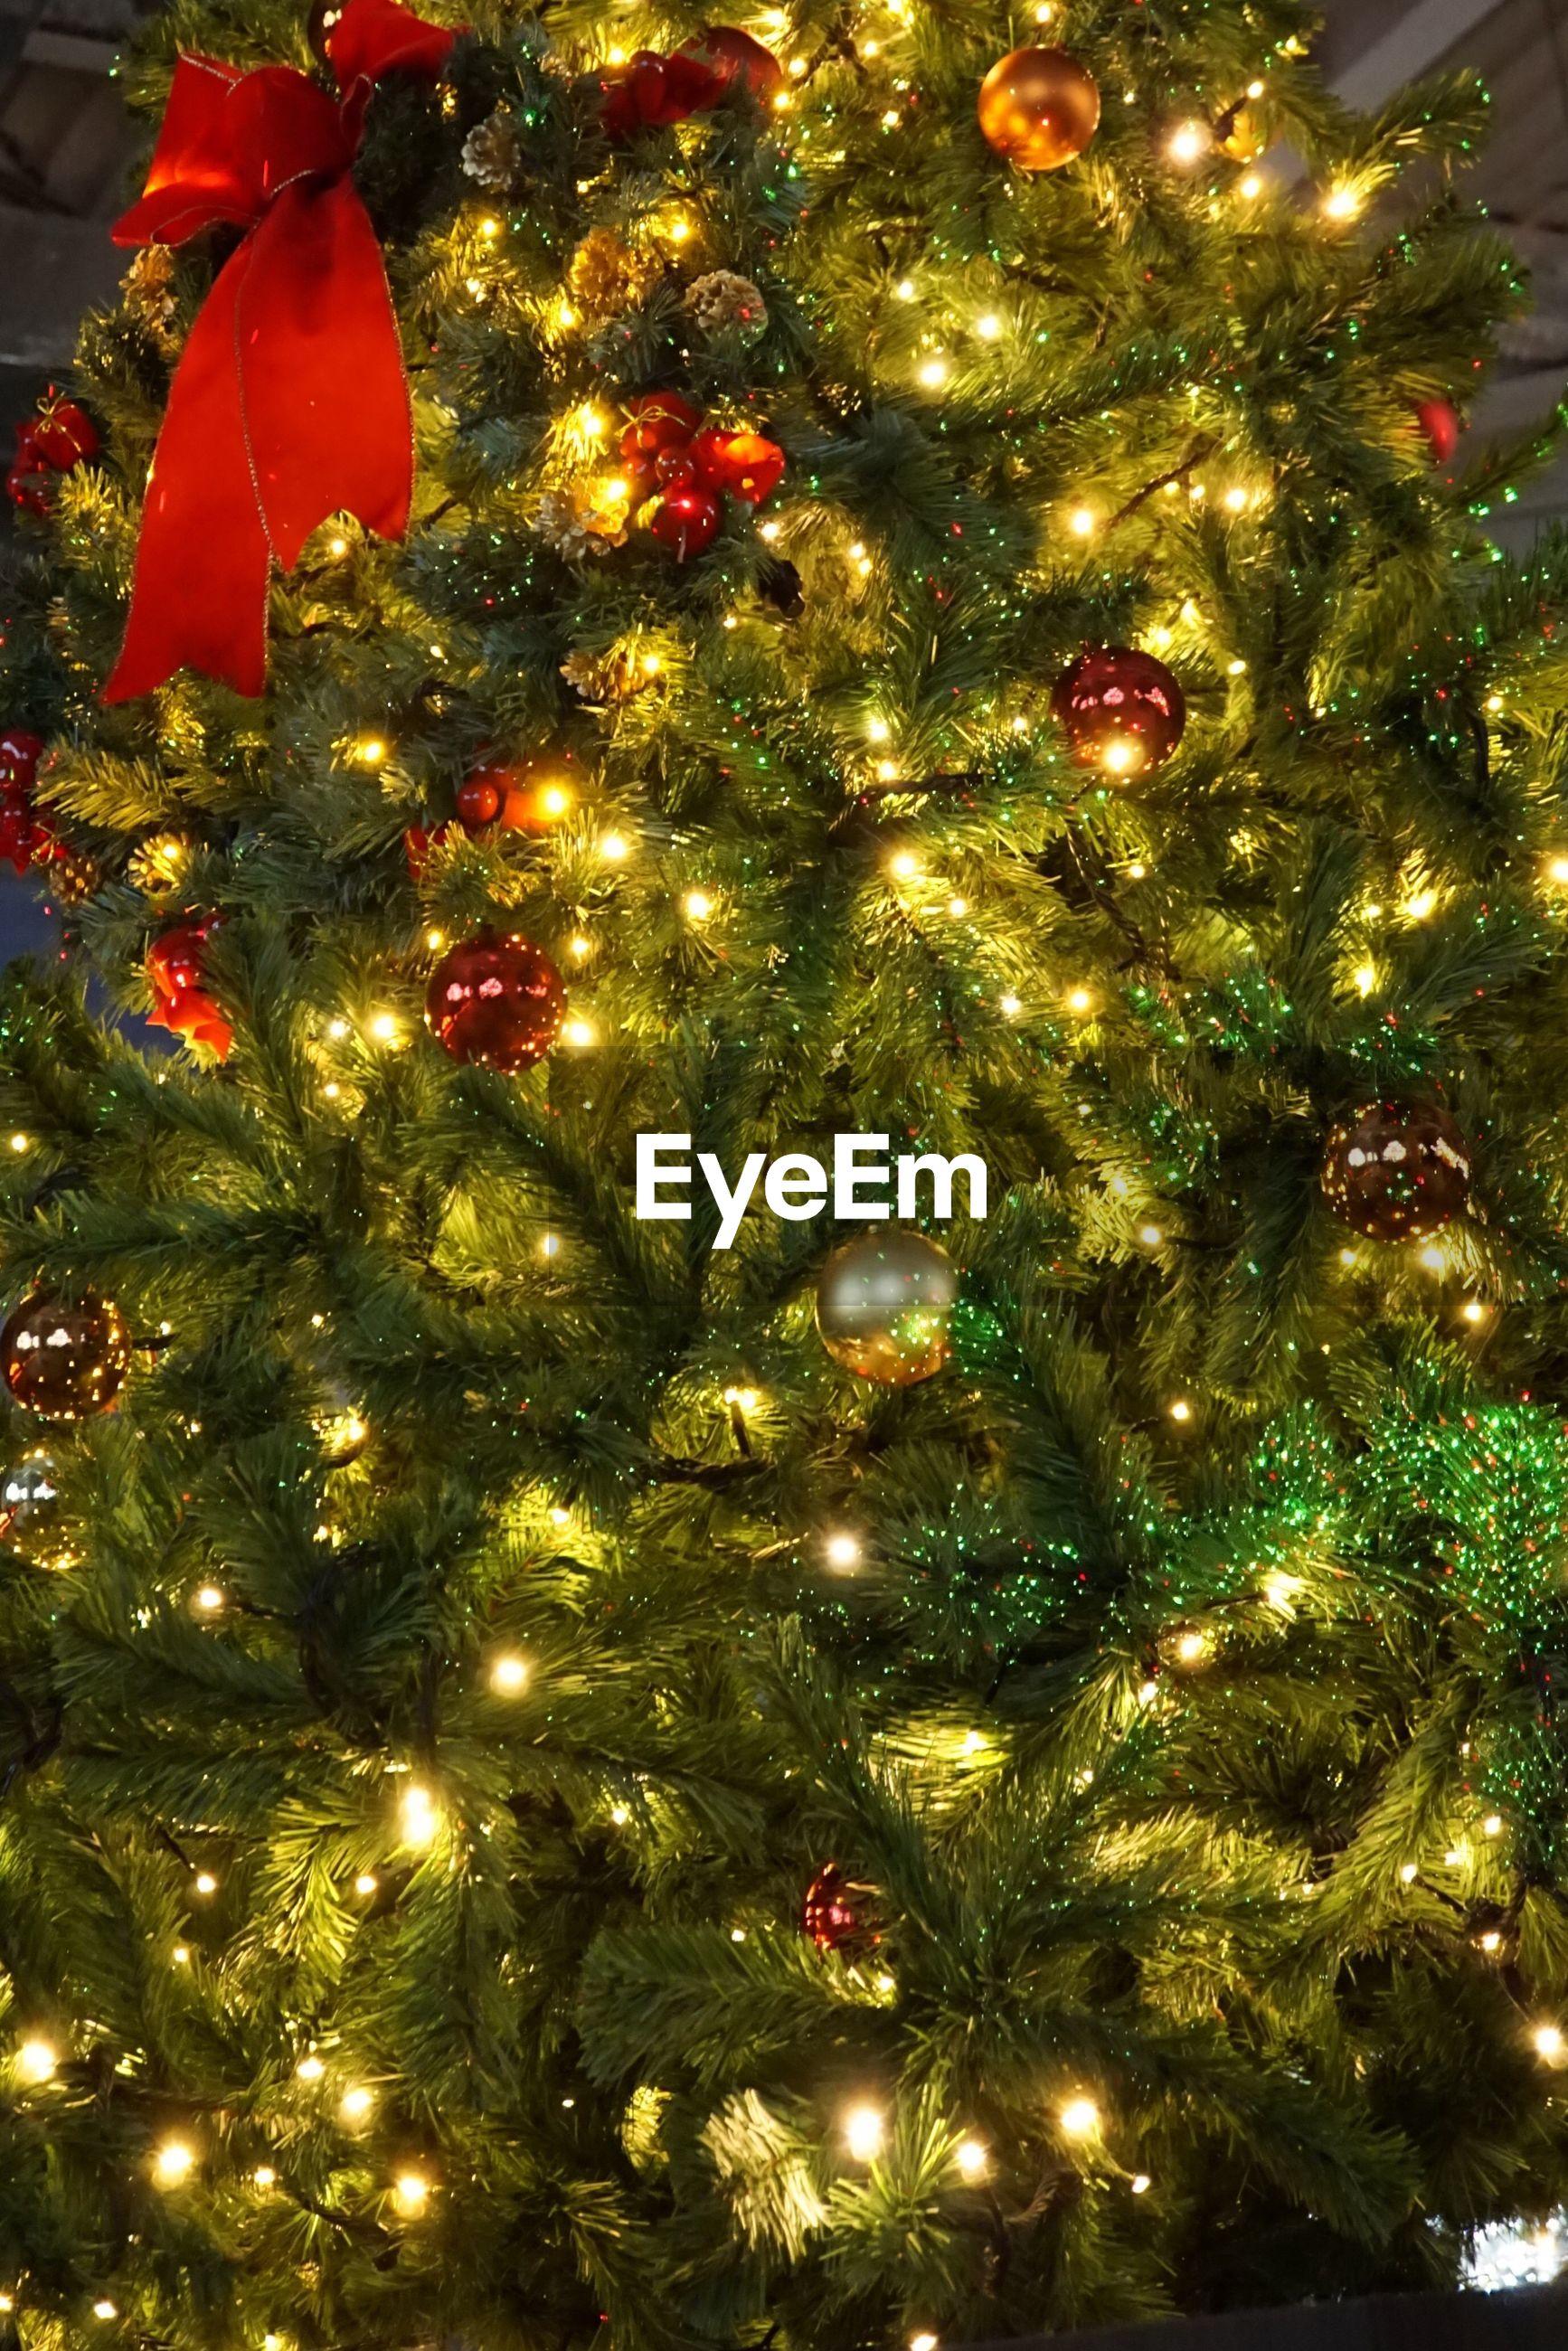 christmas, celebration, holiday, decoration, christmas tree, christmas decoration, illuminated, christmas lights, christmas ornament, tree, no people, celebration event, lighting equipment, holiday - event, full frame, indoors, event, close-up, light